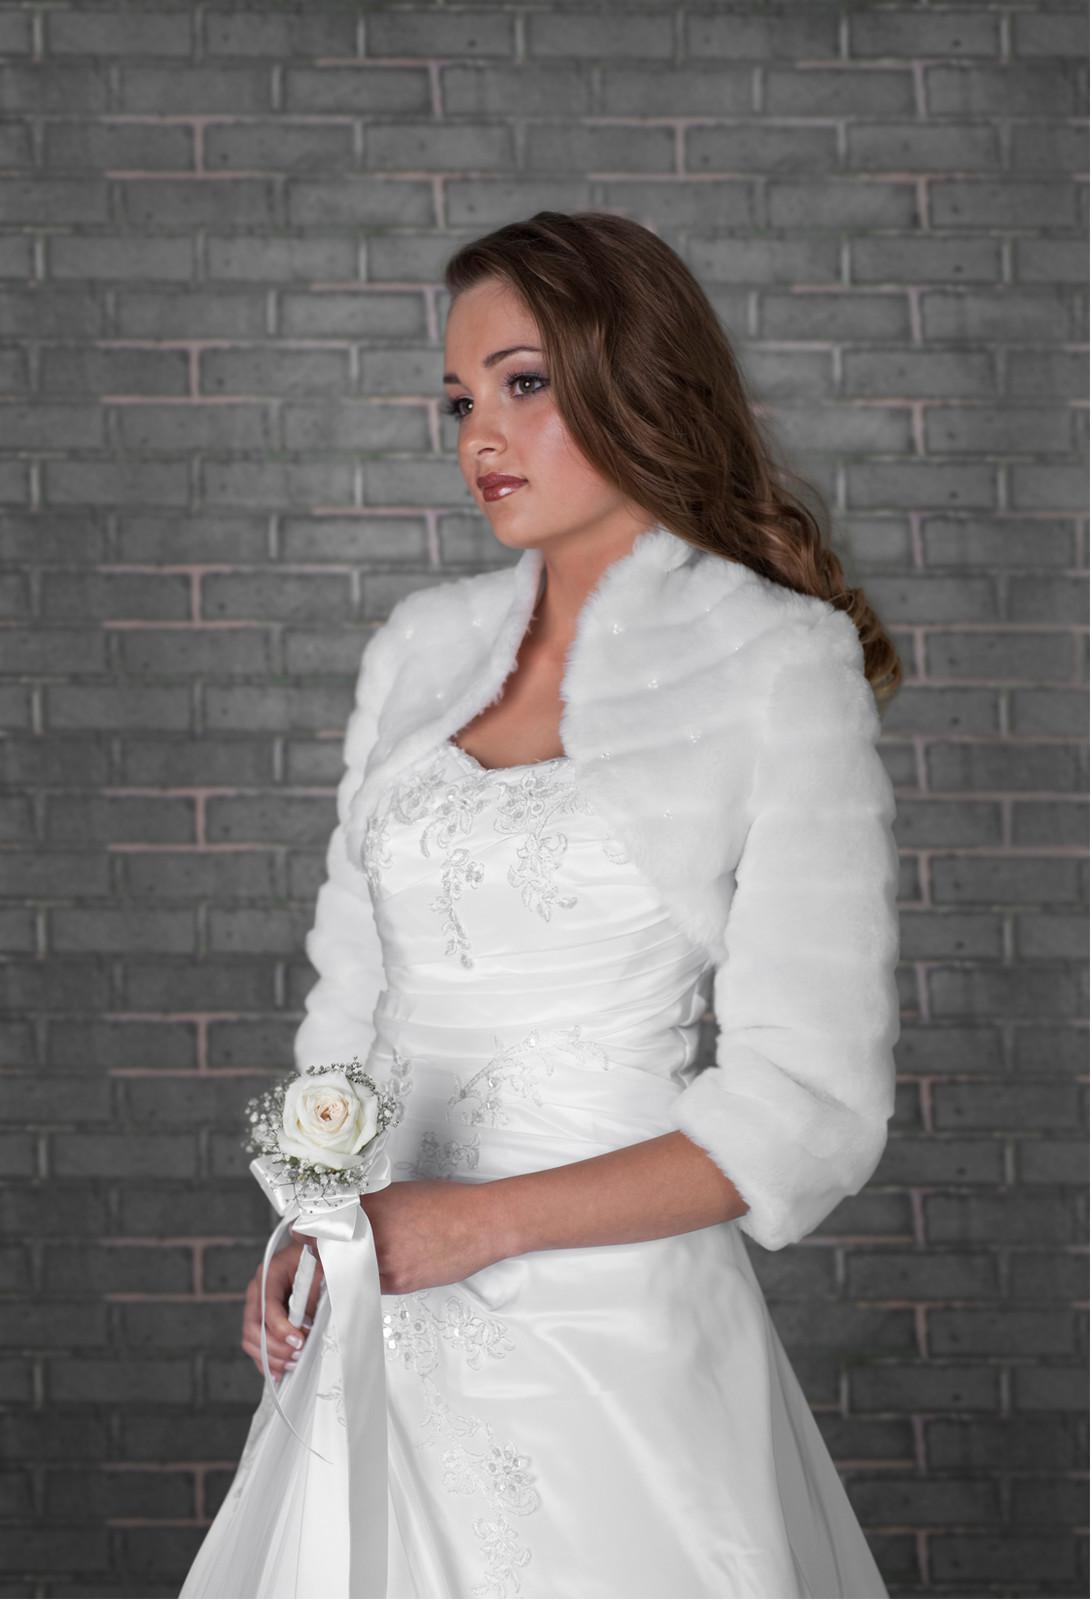 2017 wedding average size ivory faux fur shrug bridal for Fur shrug for wedding dress